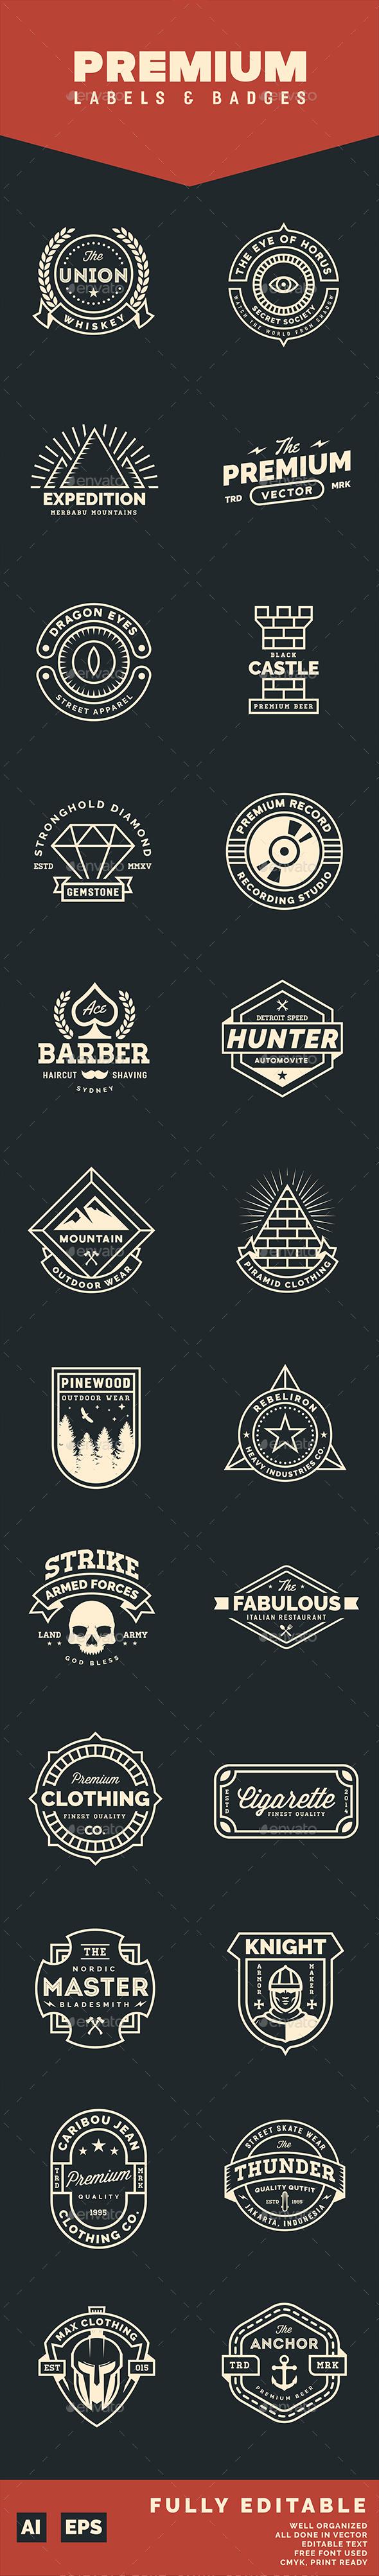 24 Premium Labels and Badges - Badges & Stickers Web Elements